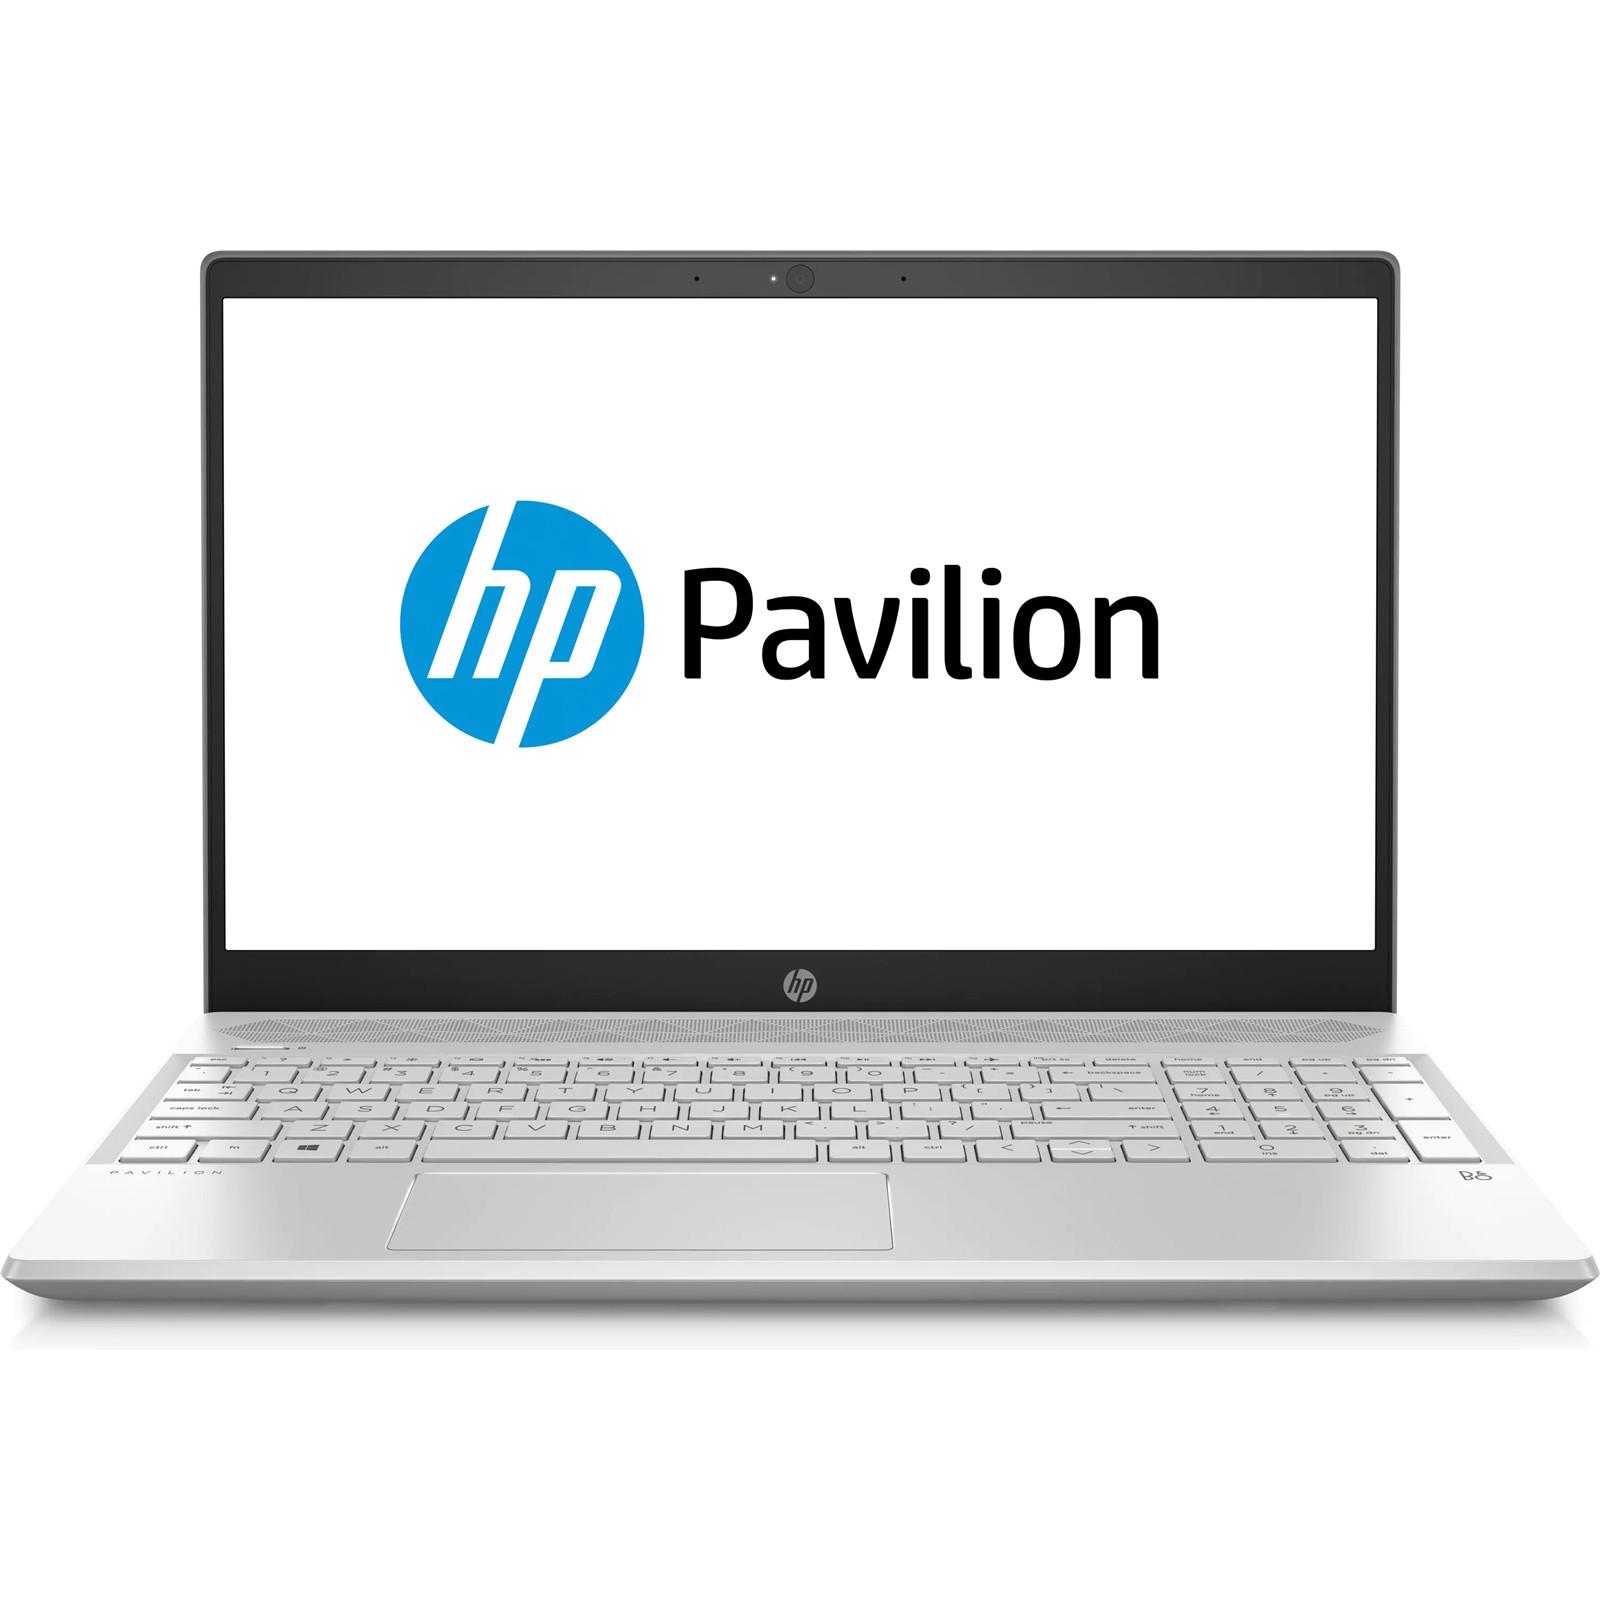 Buy the HP Pavilion 15-cs0012TX Laptop 15 6